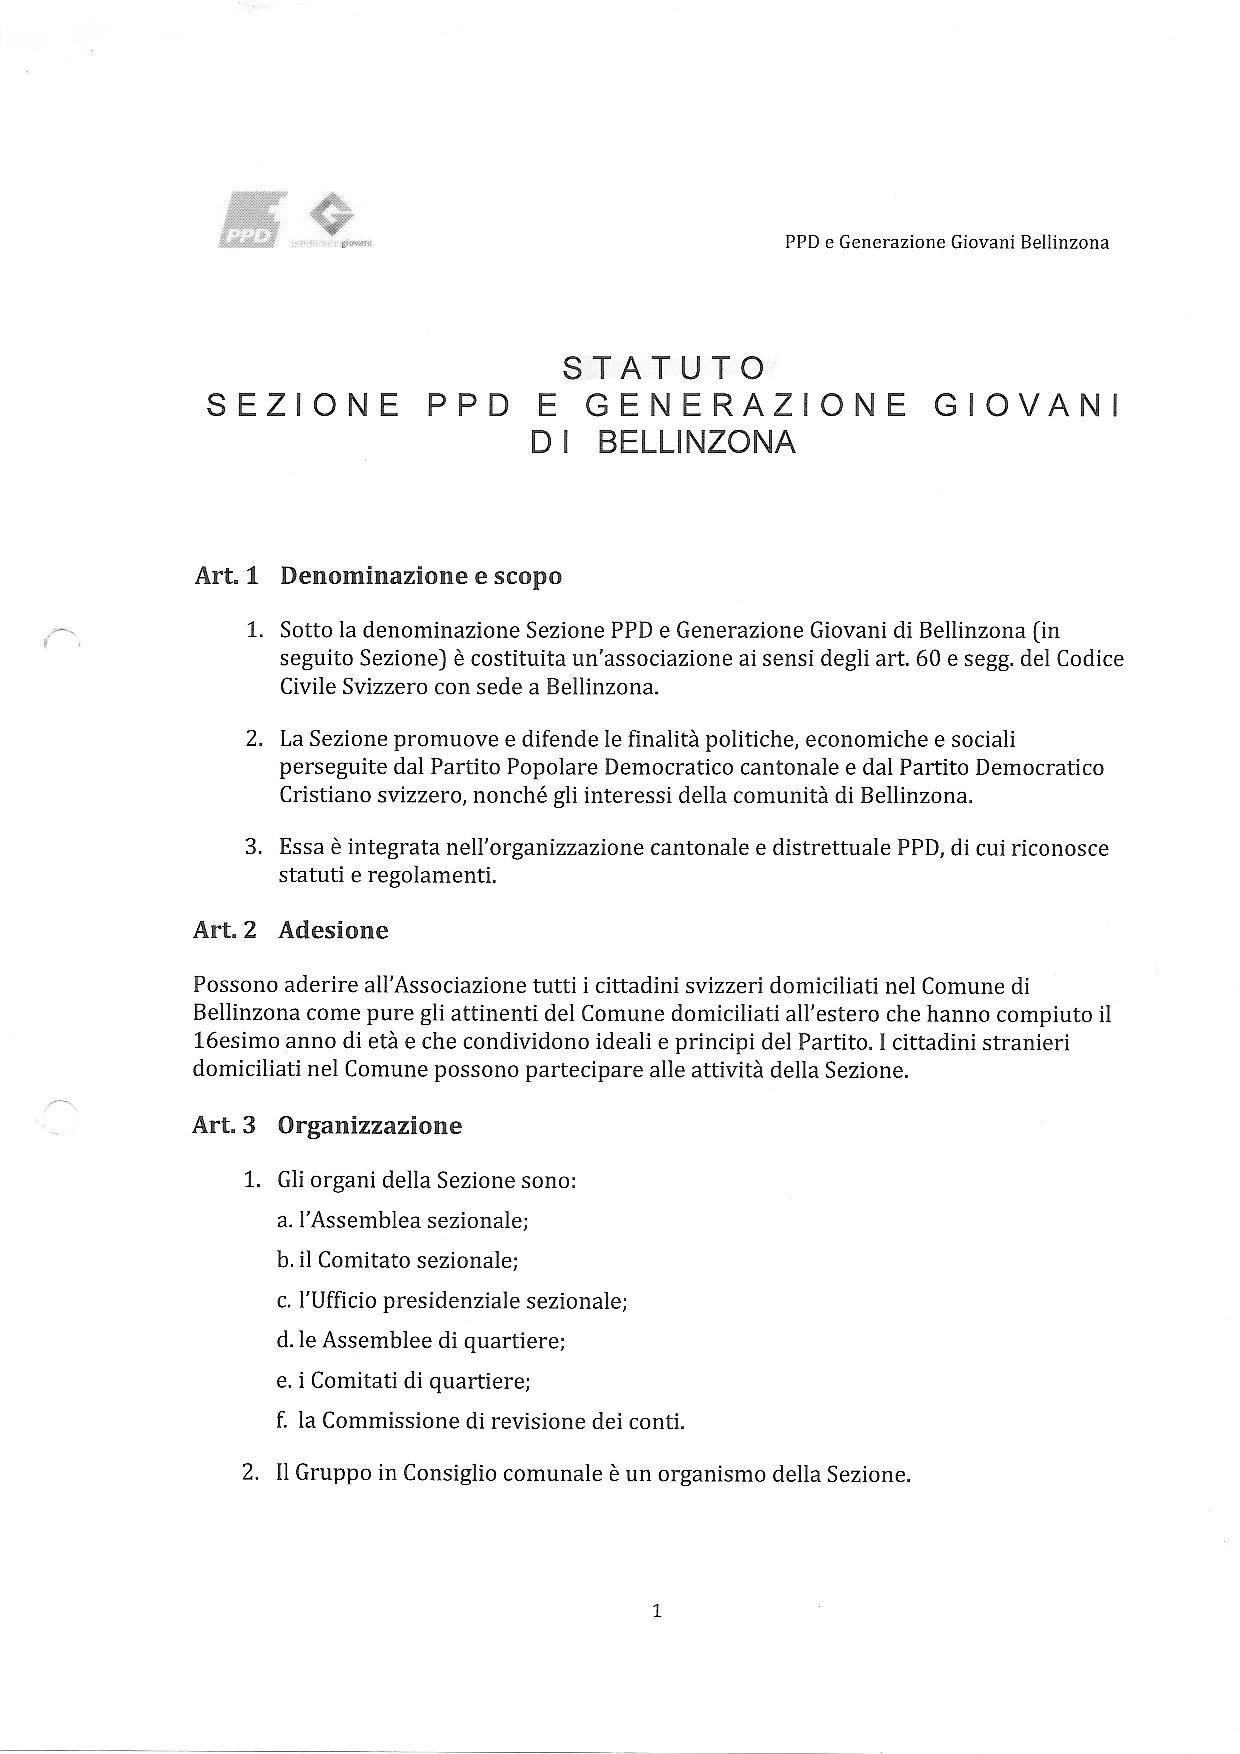 STATUTO NUOVA BELLINZONA (0473973)-page-001.jpg